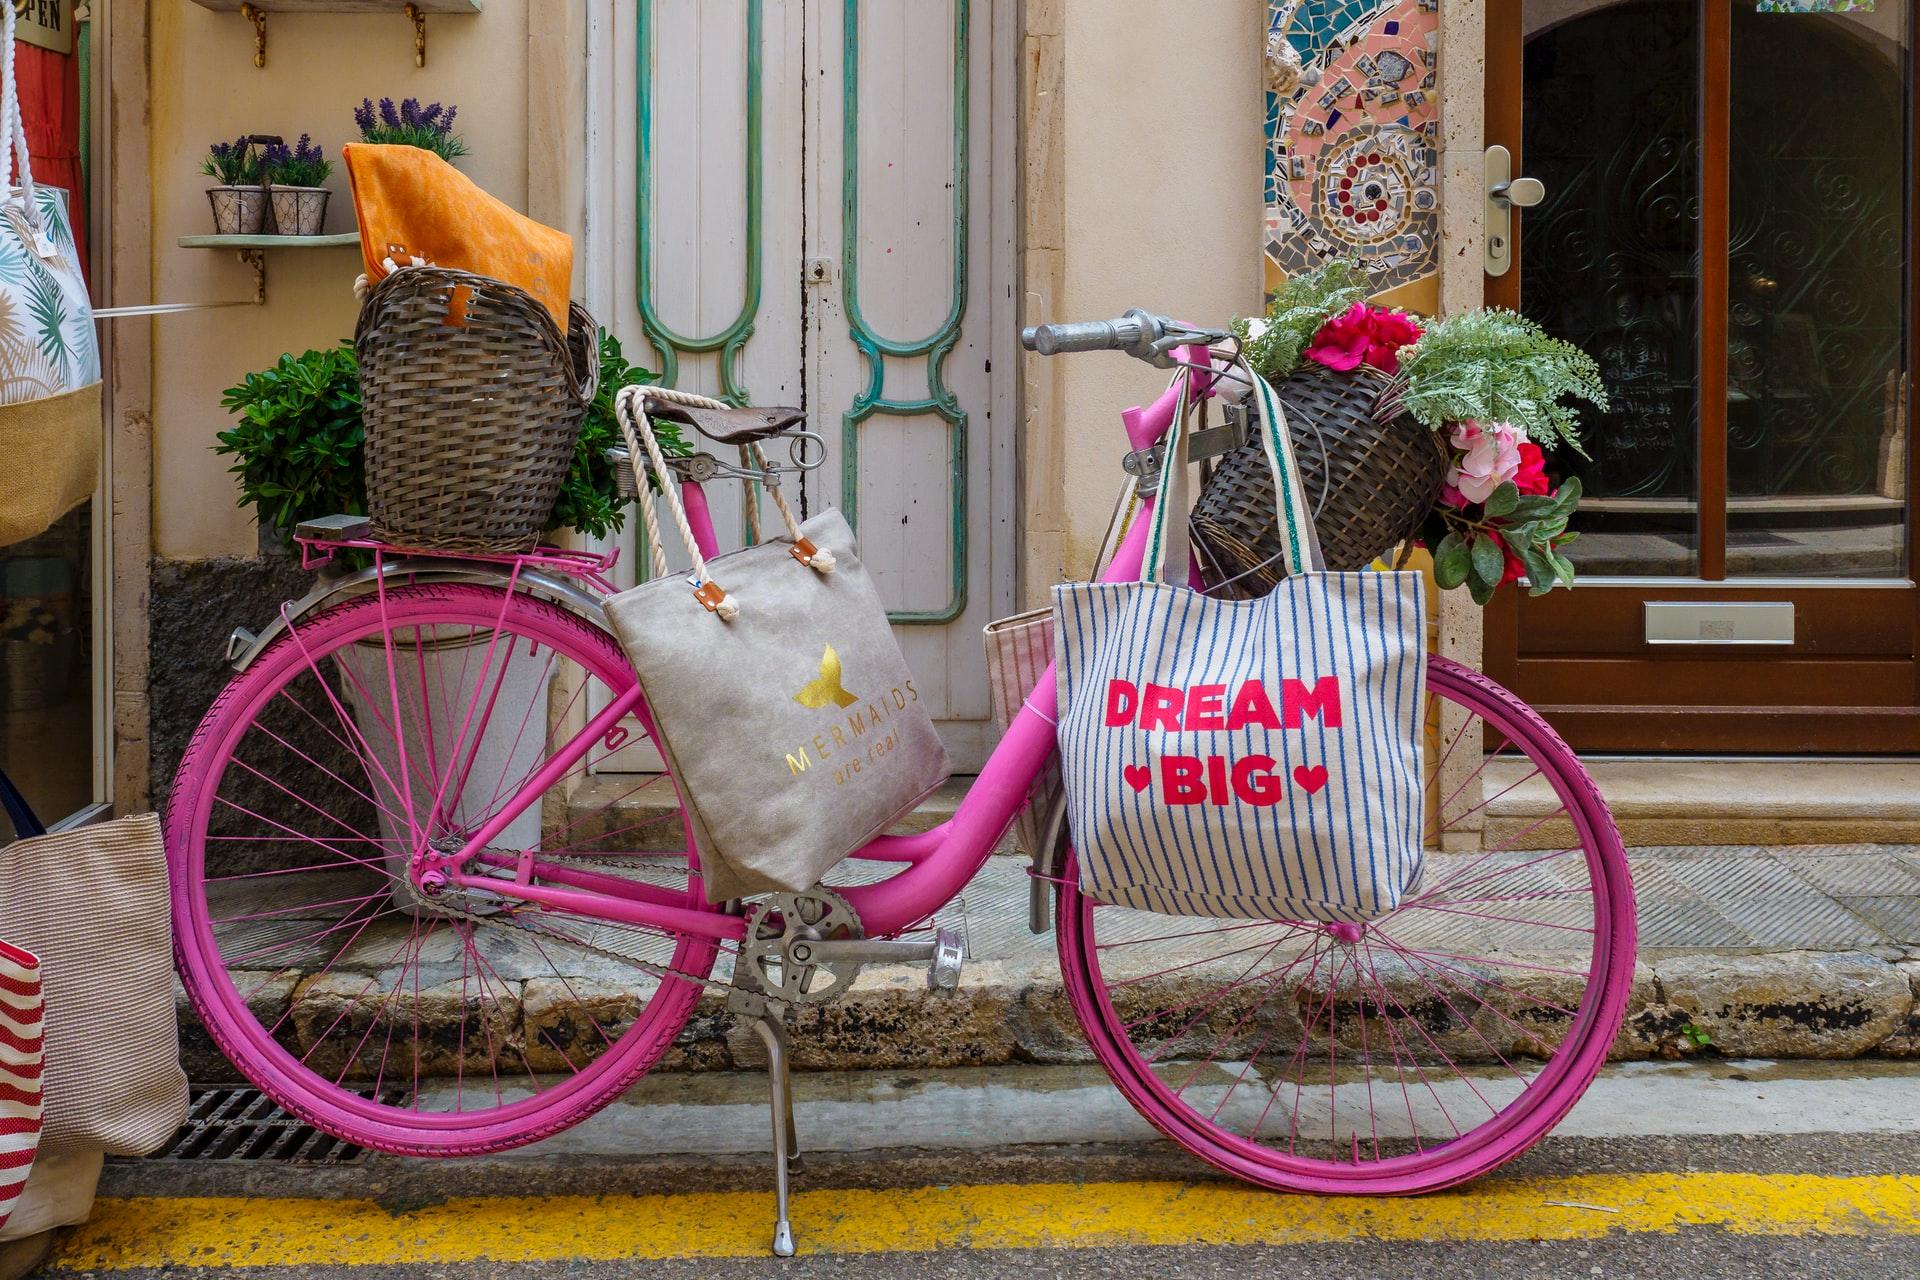 Bohème-Boho-style pink bike